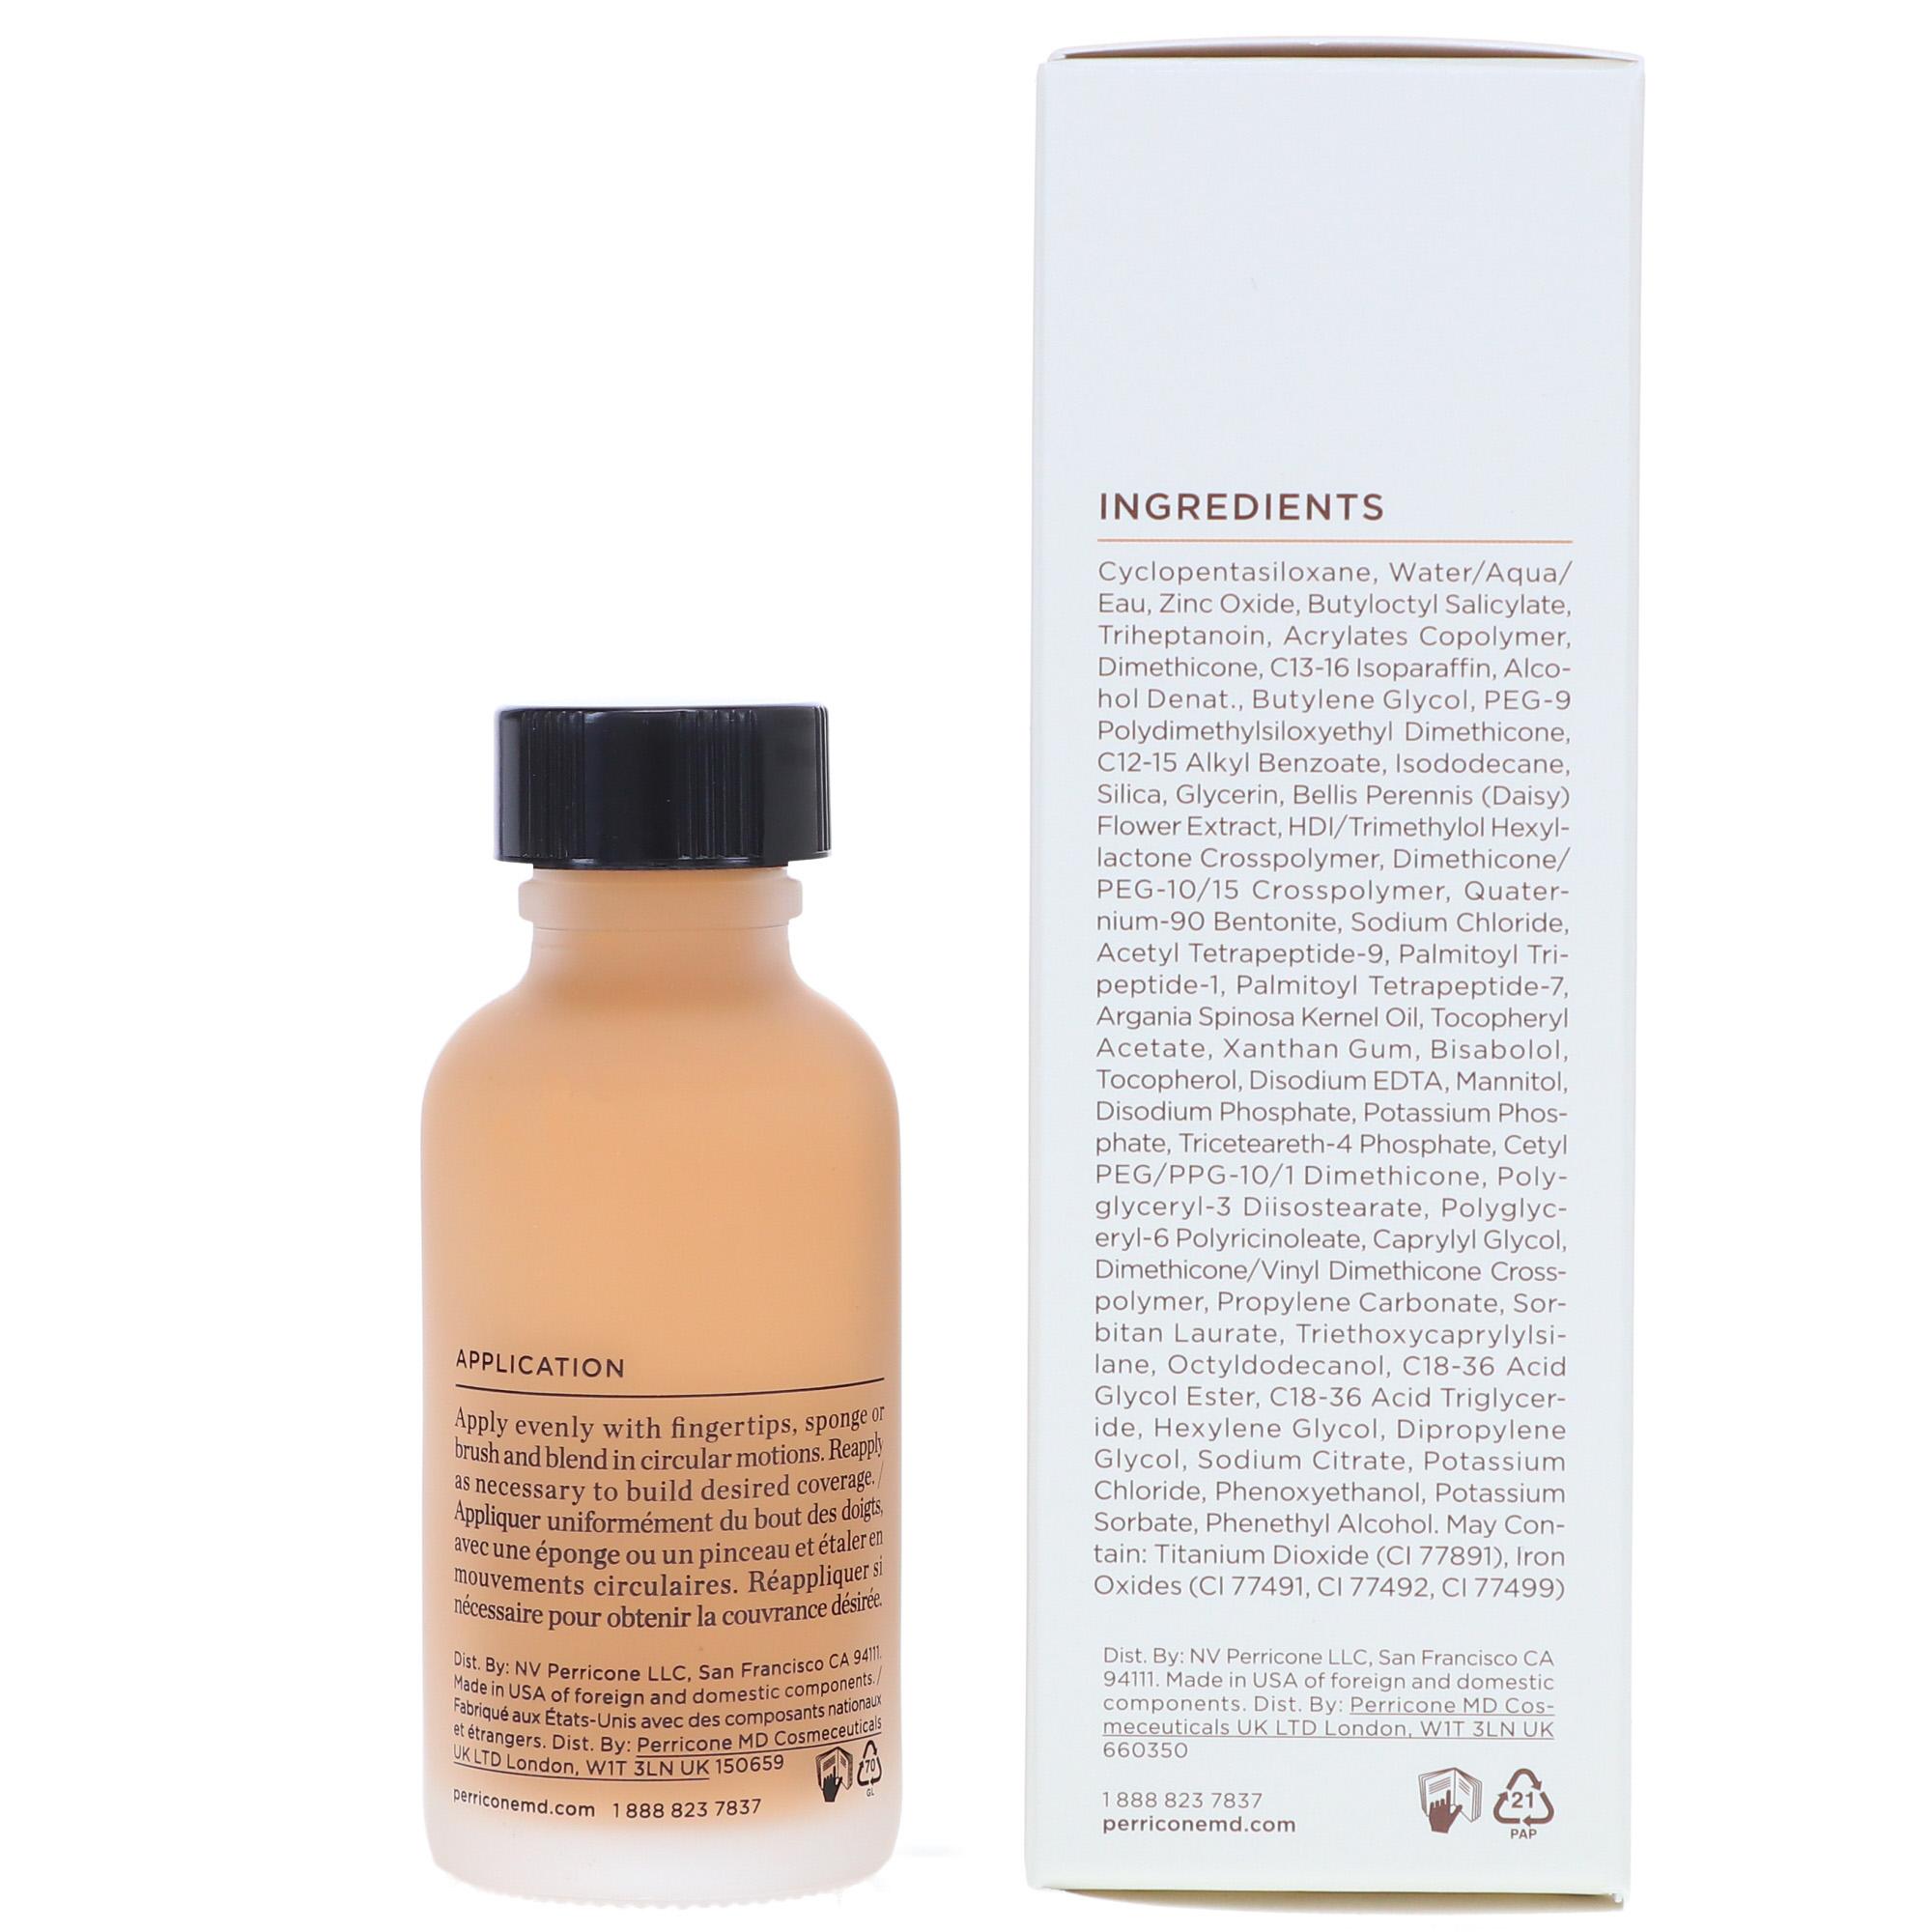 Perricone MD No Makeup Foundation Serum SPF 20 - 1 oz Nude